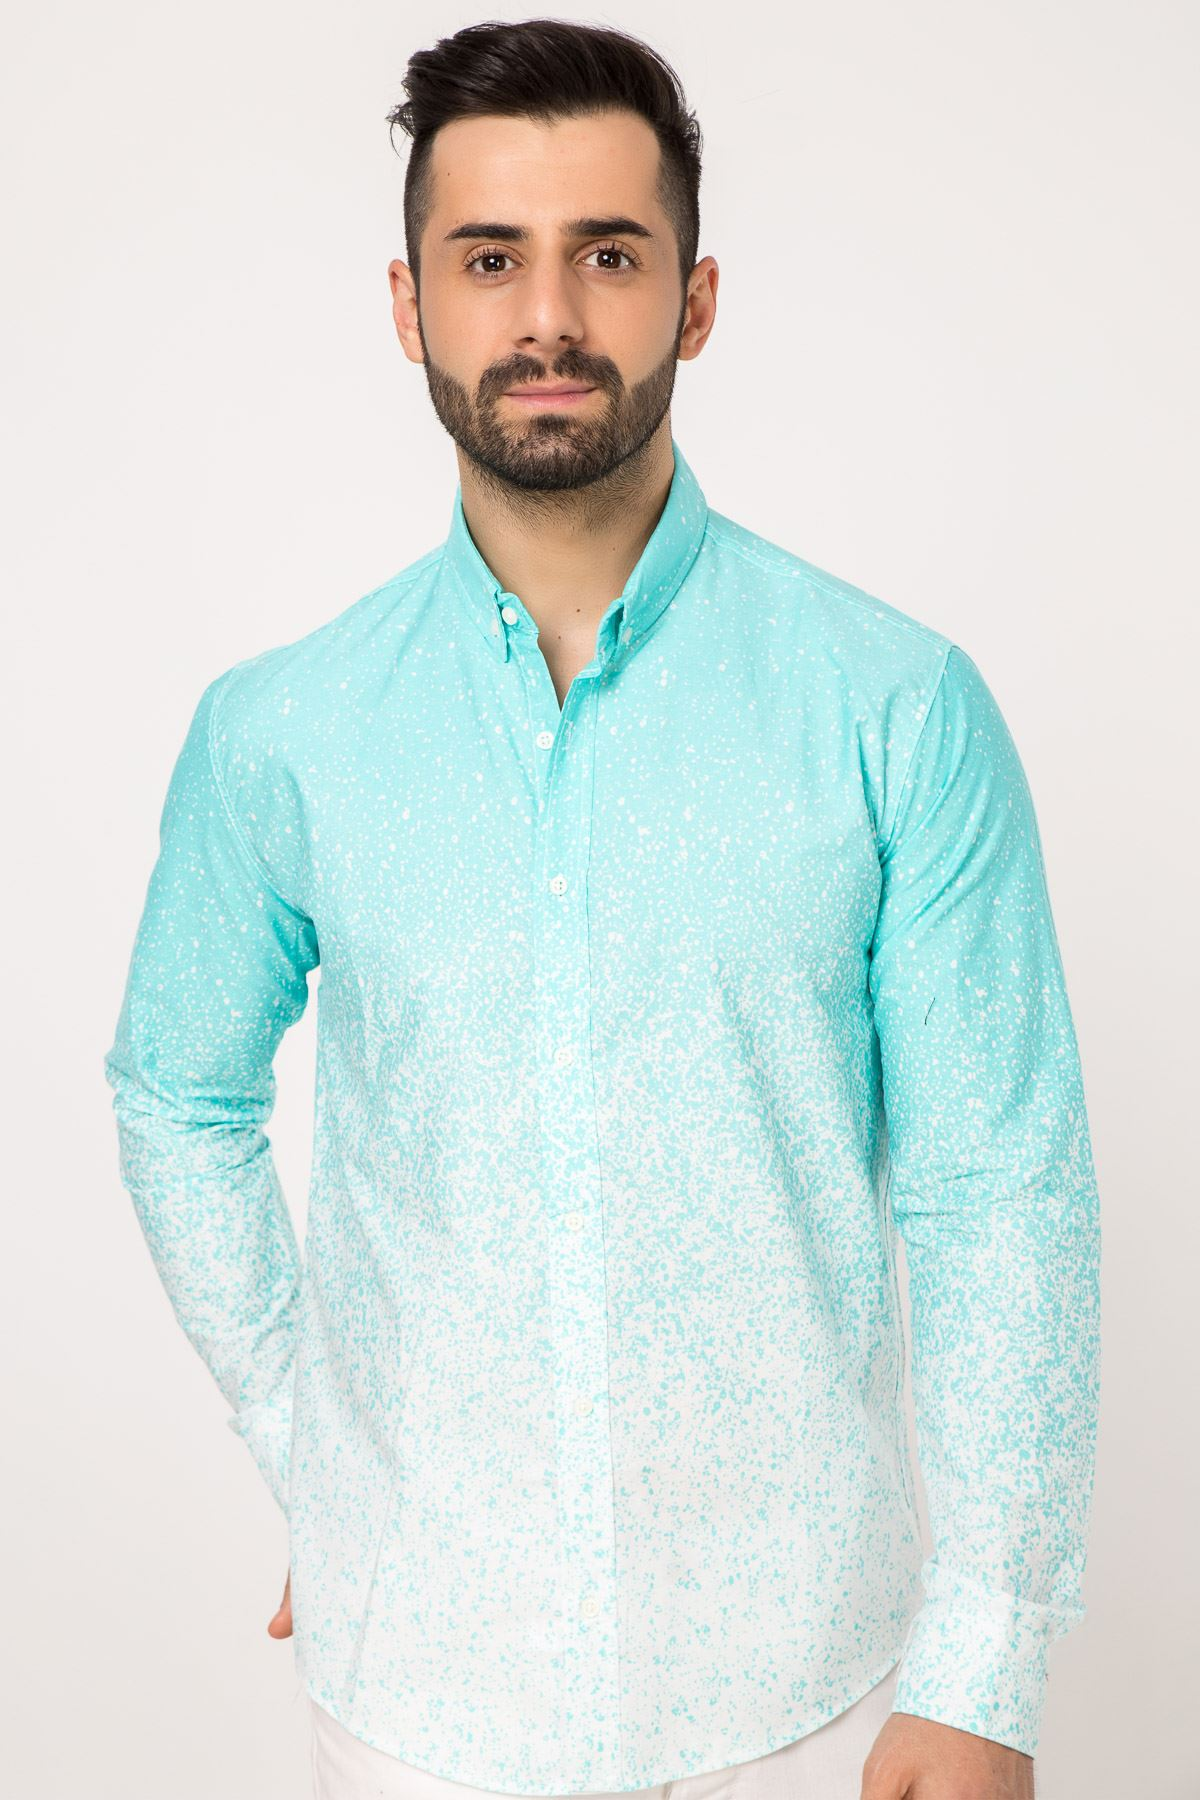 قميص منقوش لون اخضر فاتح